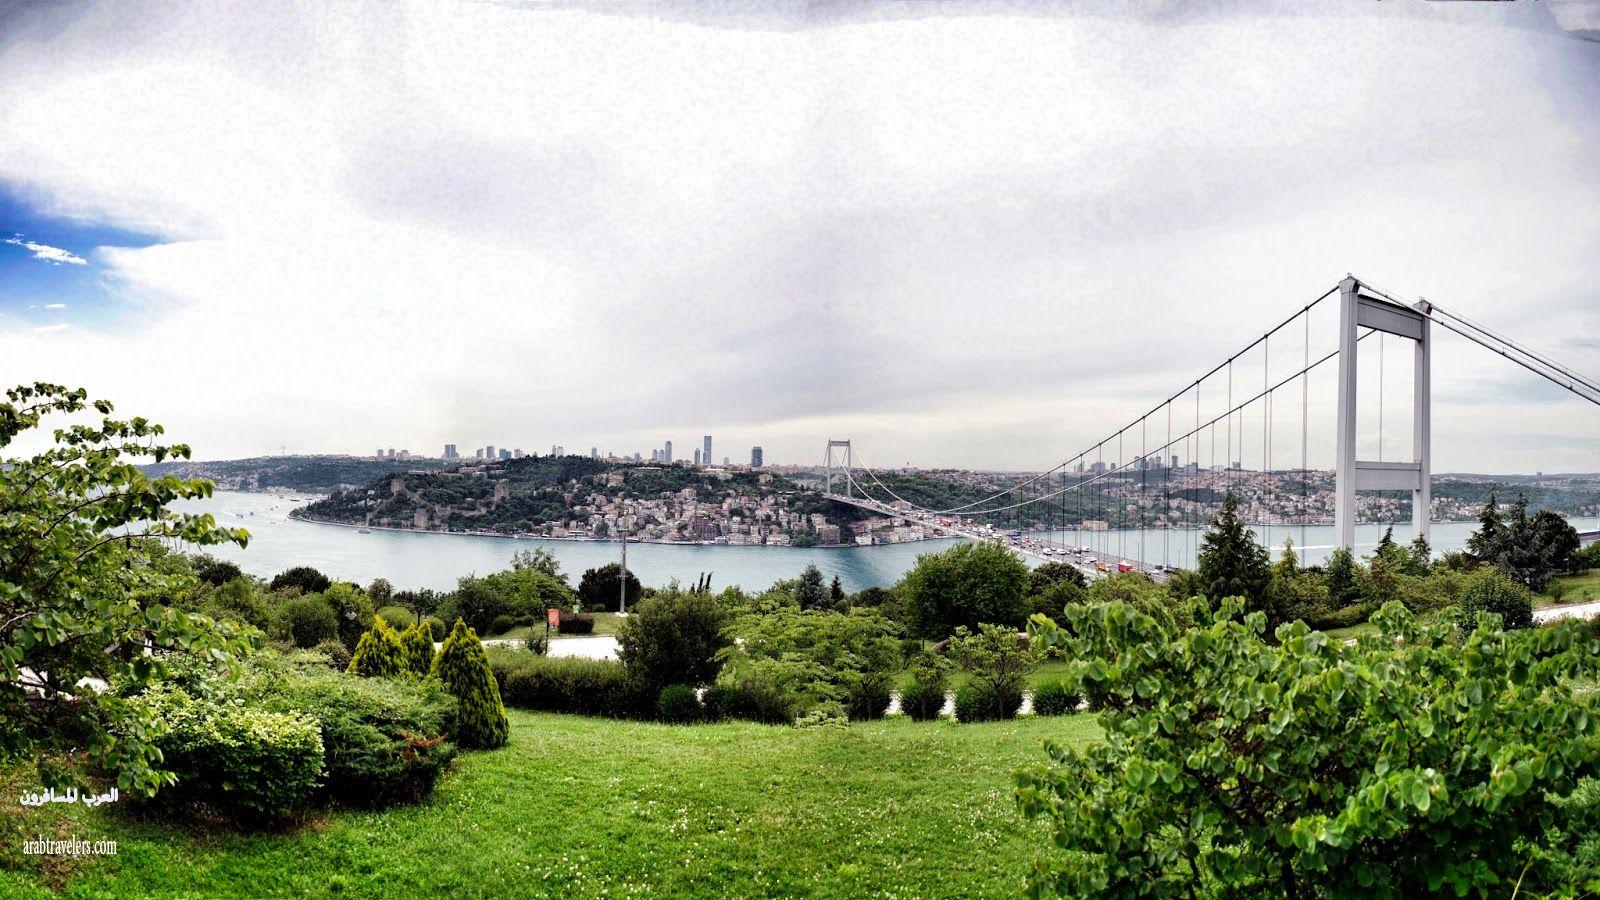 اجمل صور حدائق تركيا